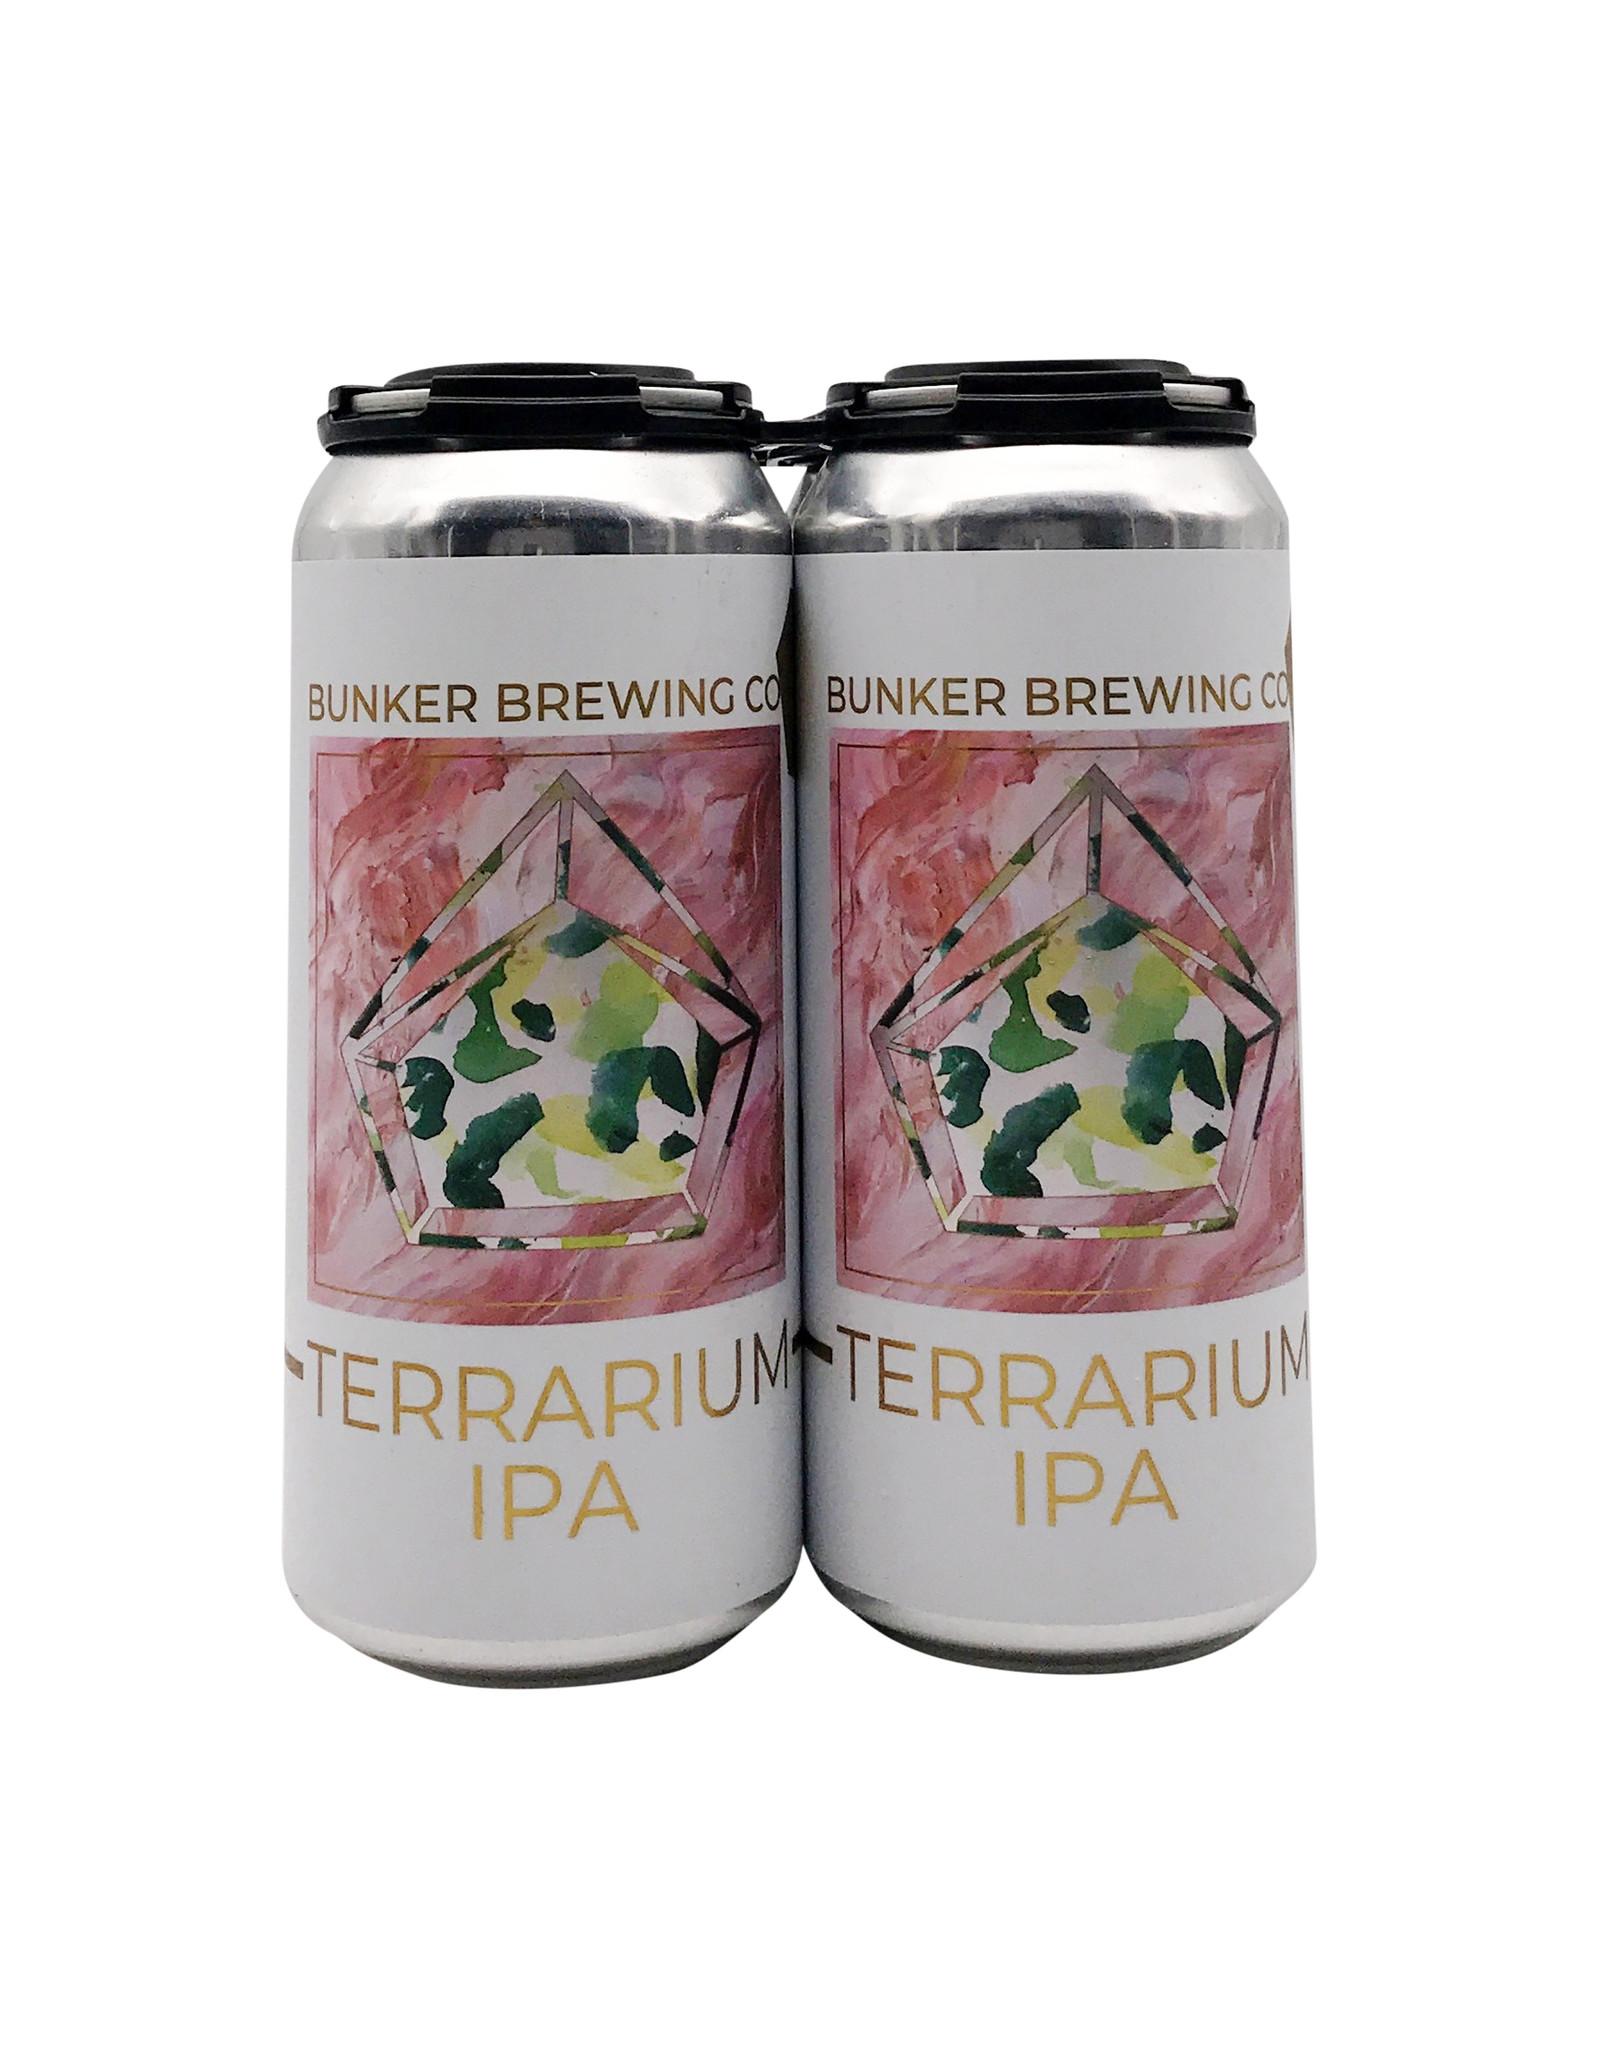 Bunker Brewing Co. Terrarium IPA 4-Pack